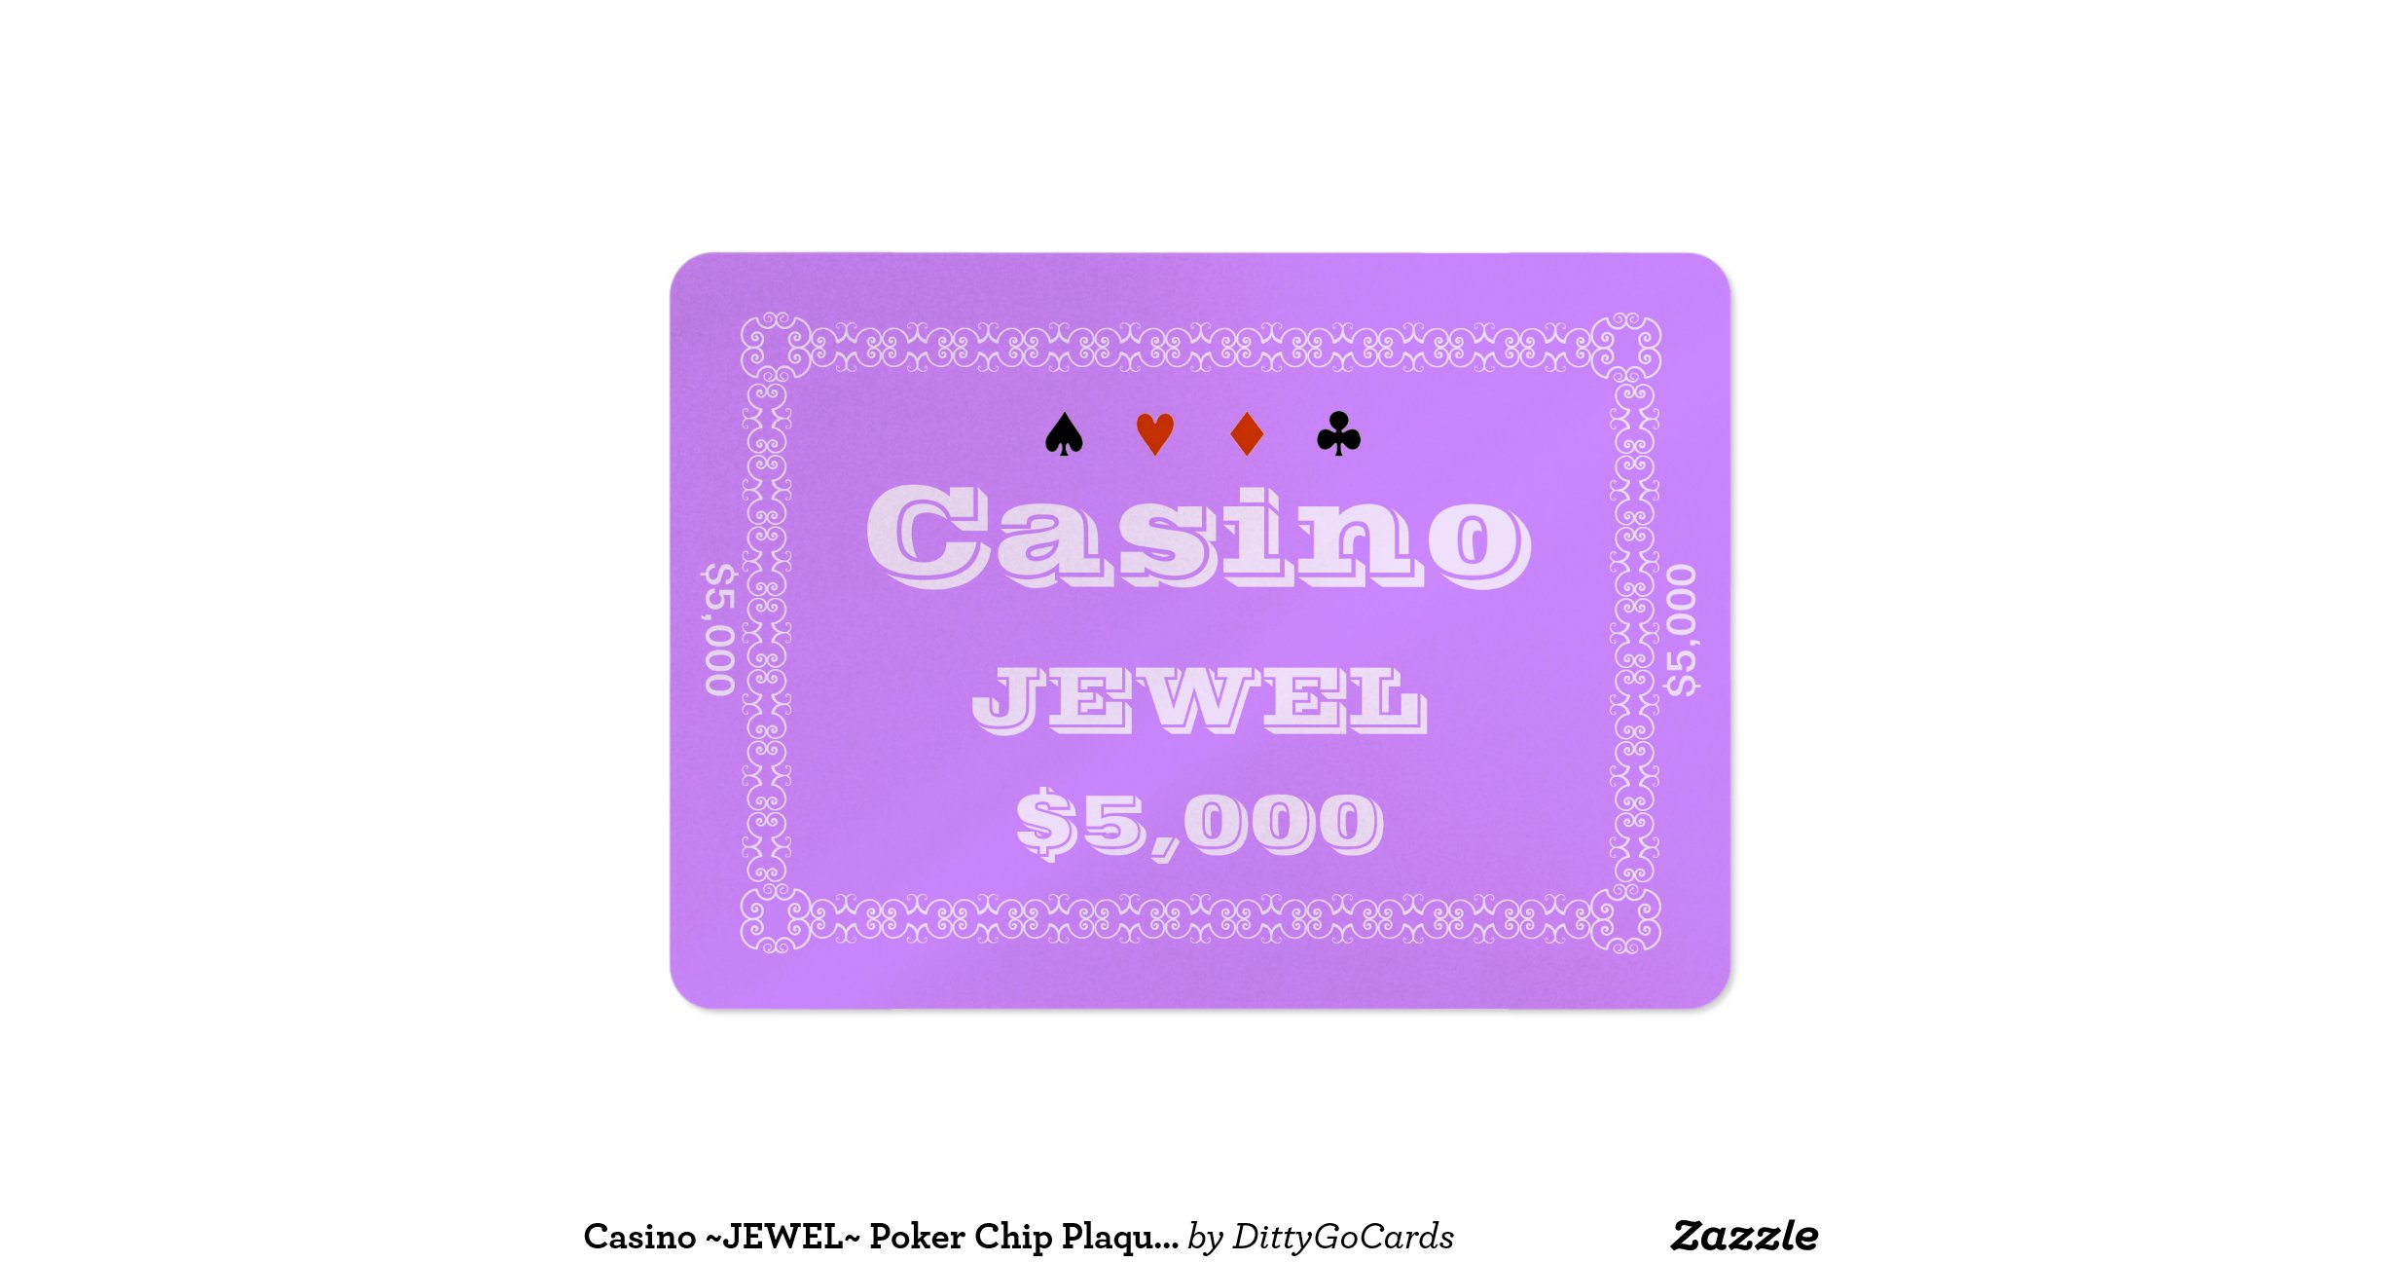 Casino chip manufacturers 16